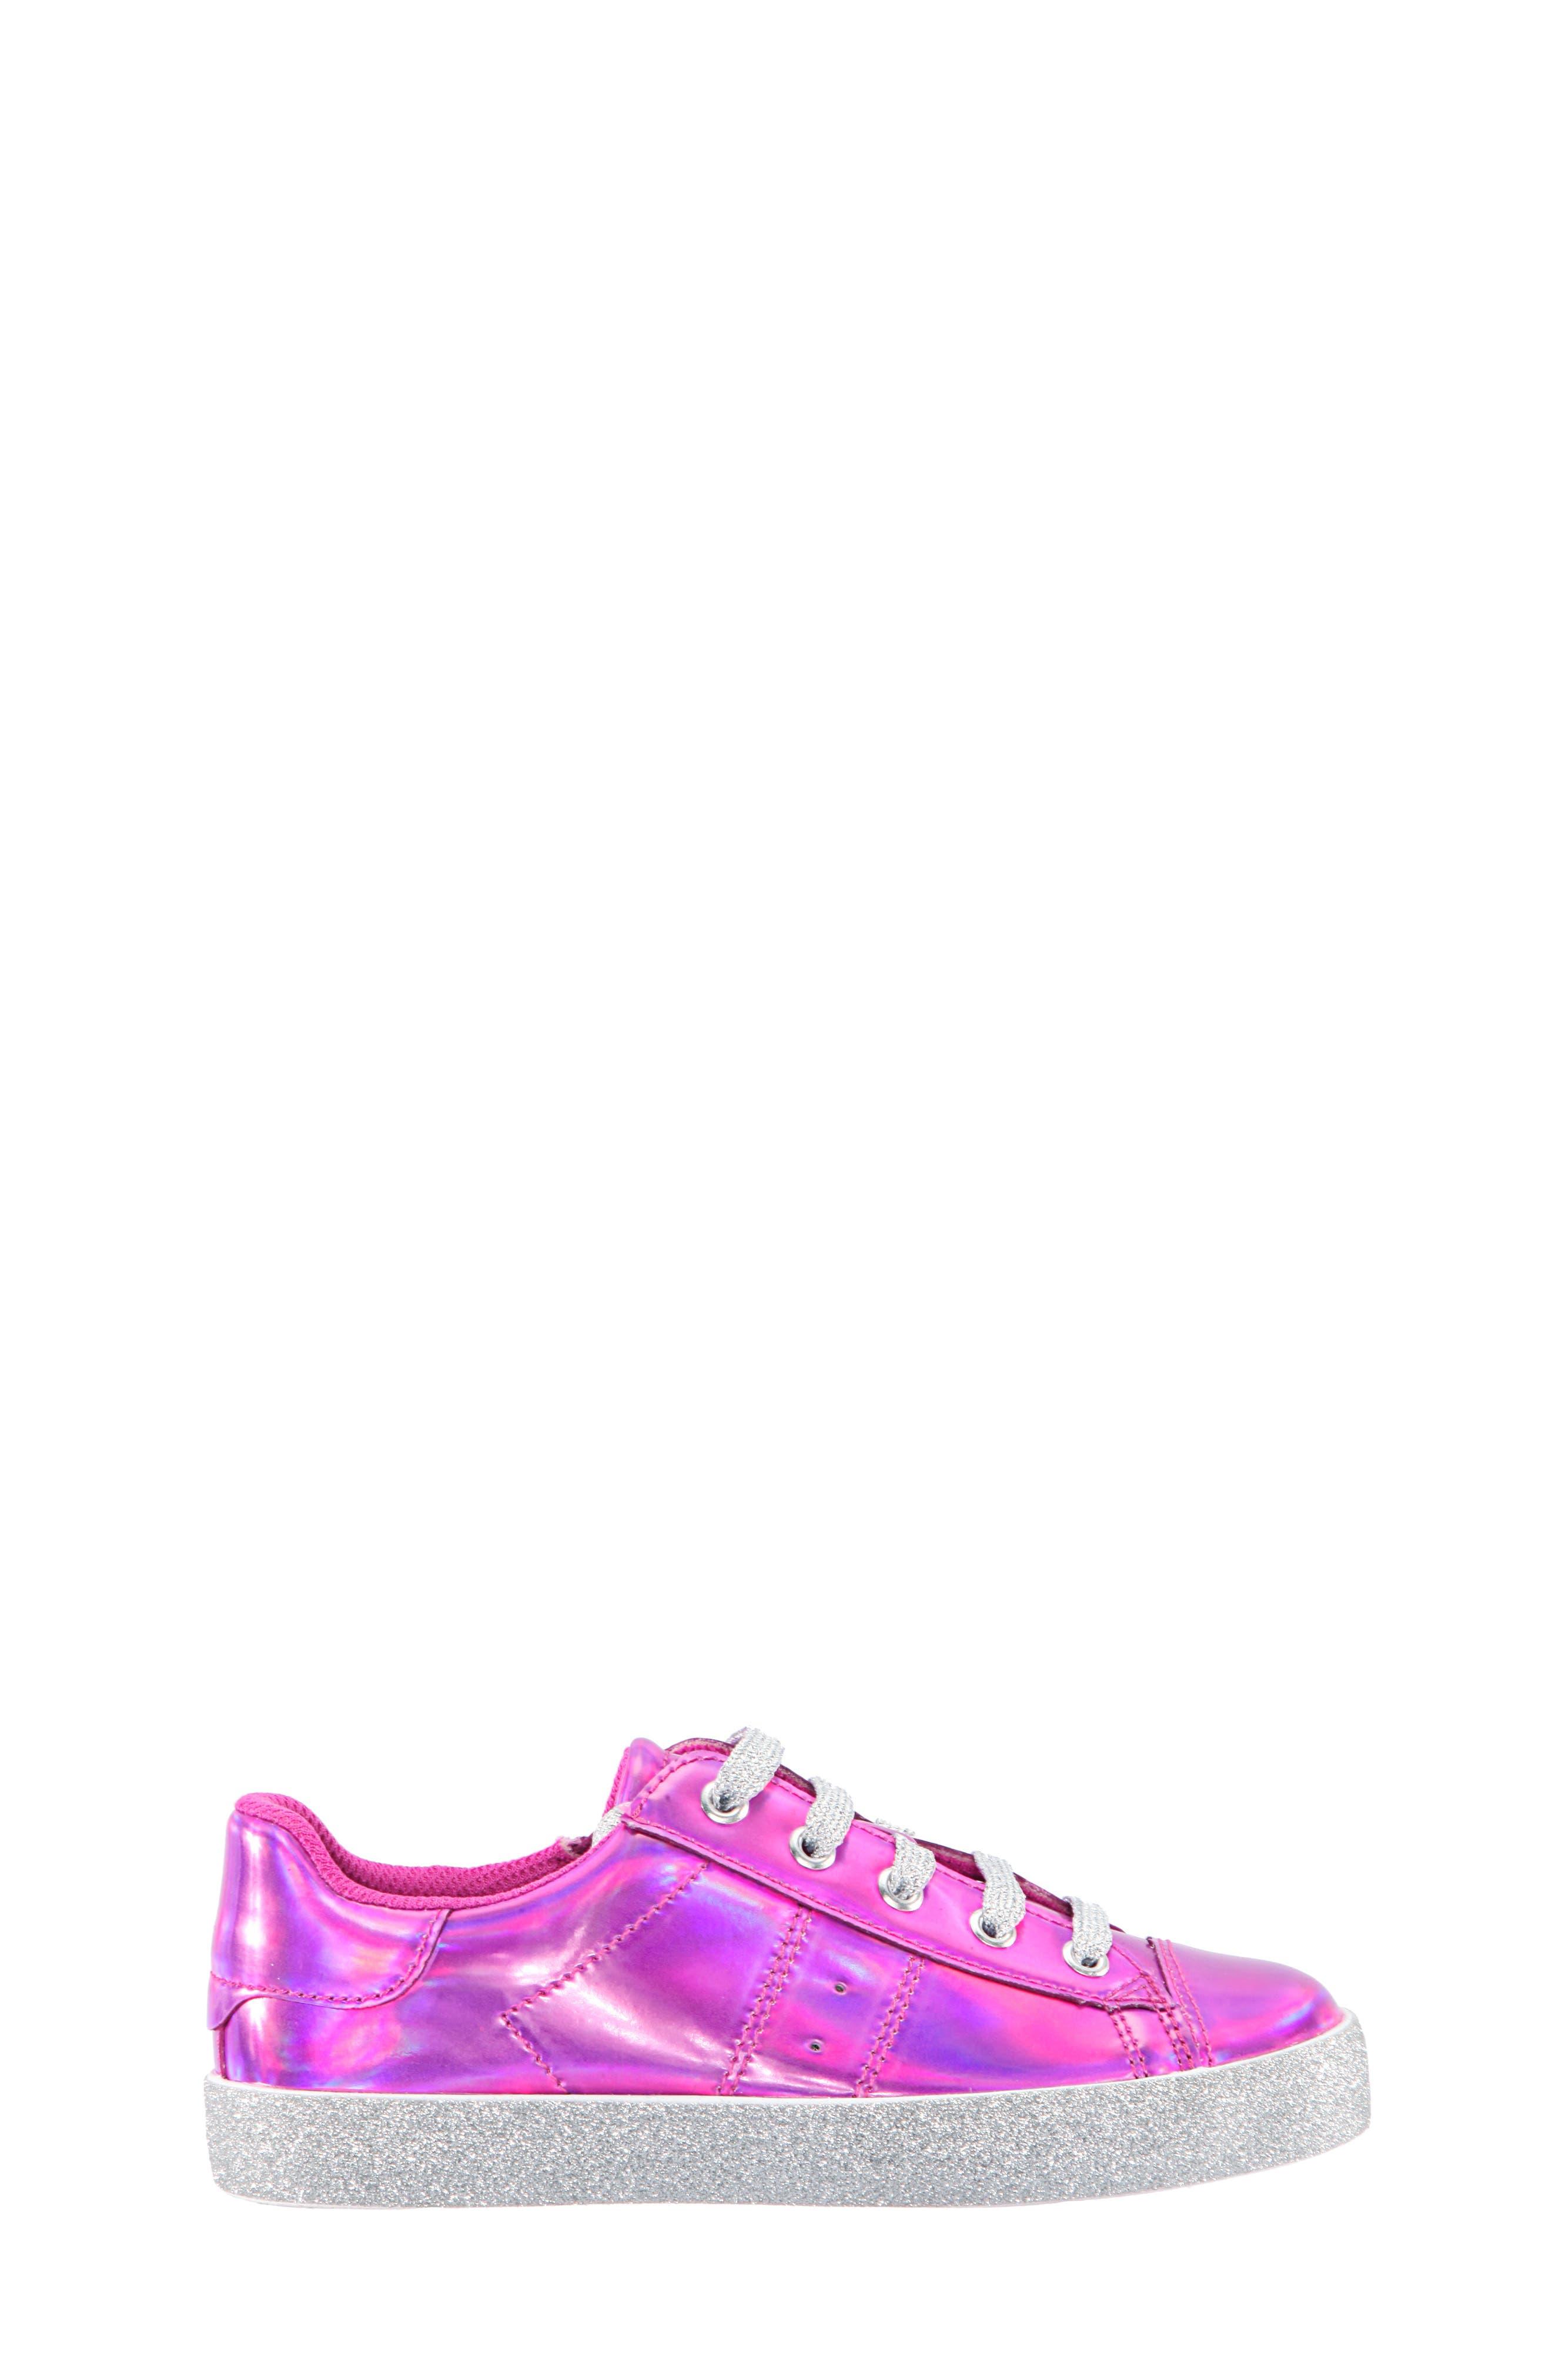 Jovana Glitter Low-Top Sneaker,                             Alternate thumbnail 5, color,                             Pink Patent